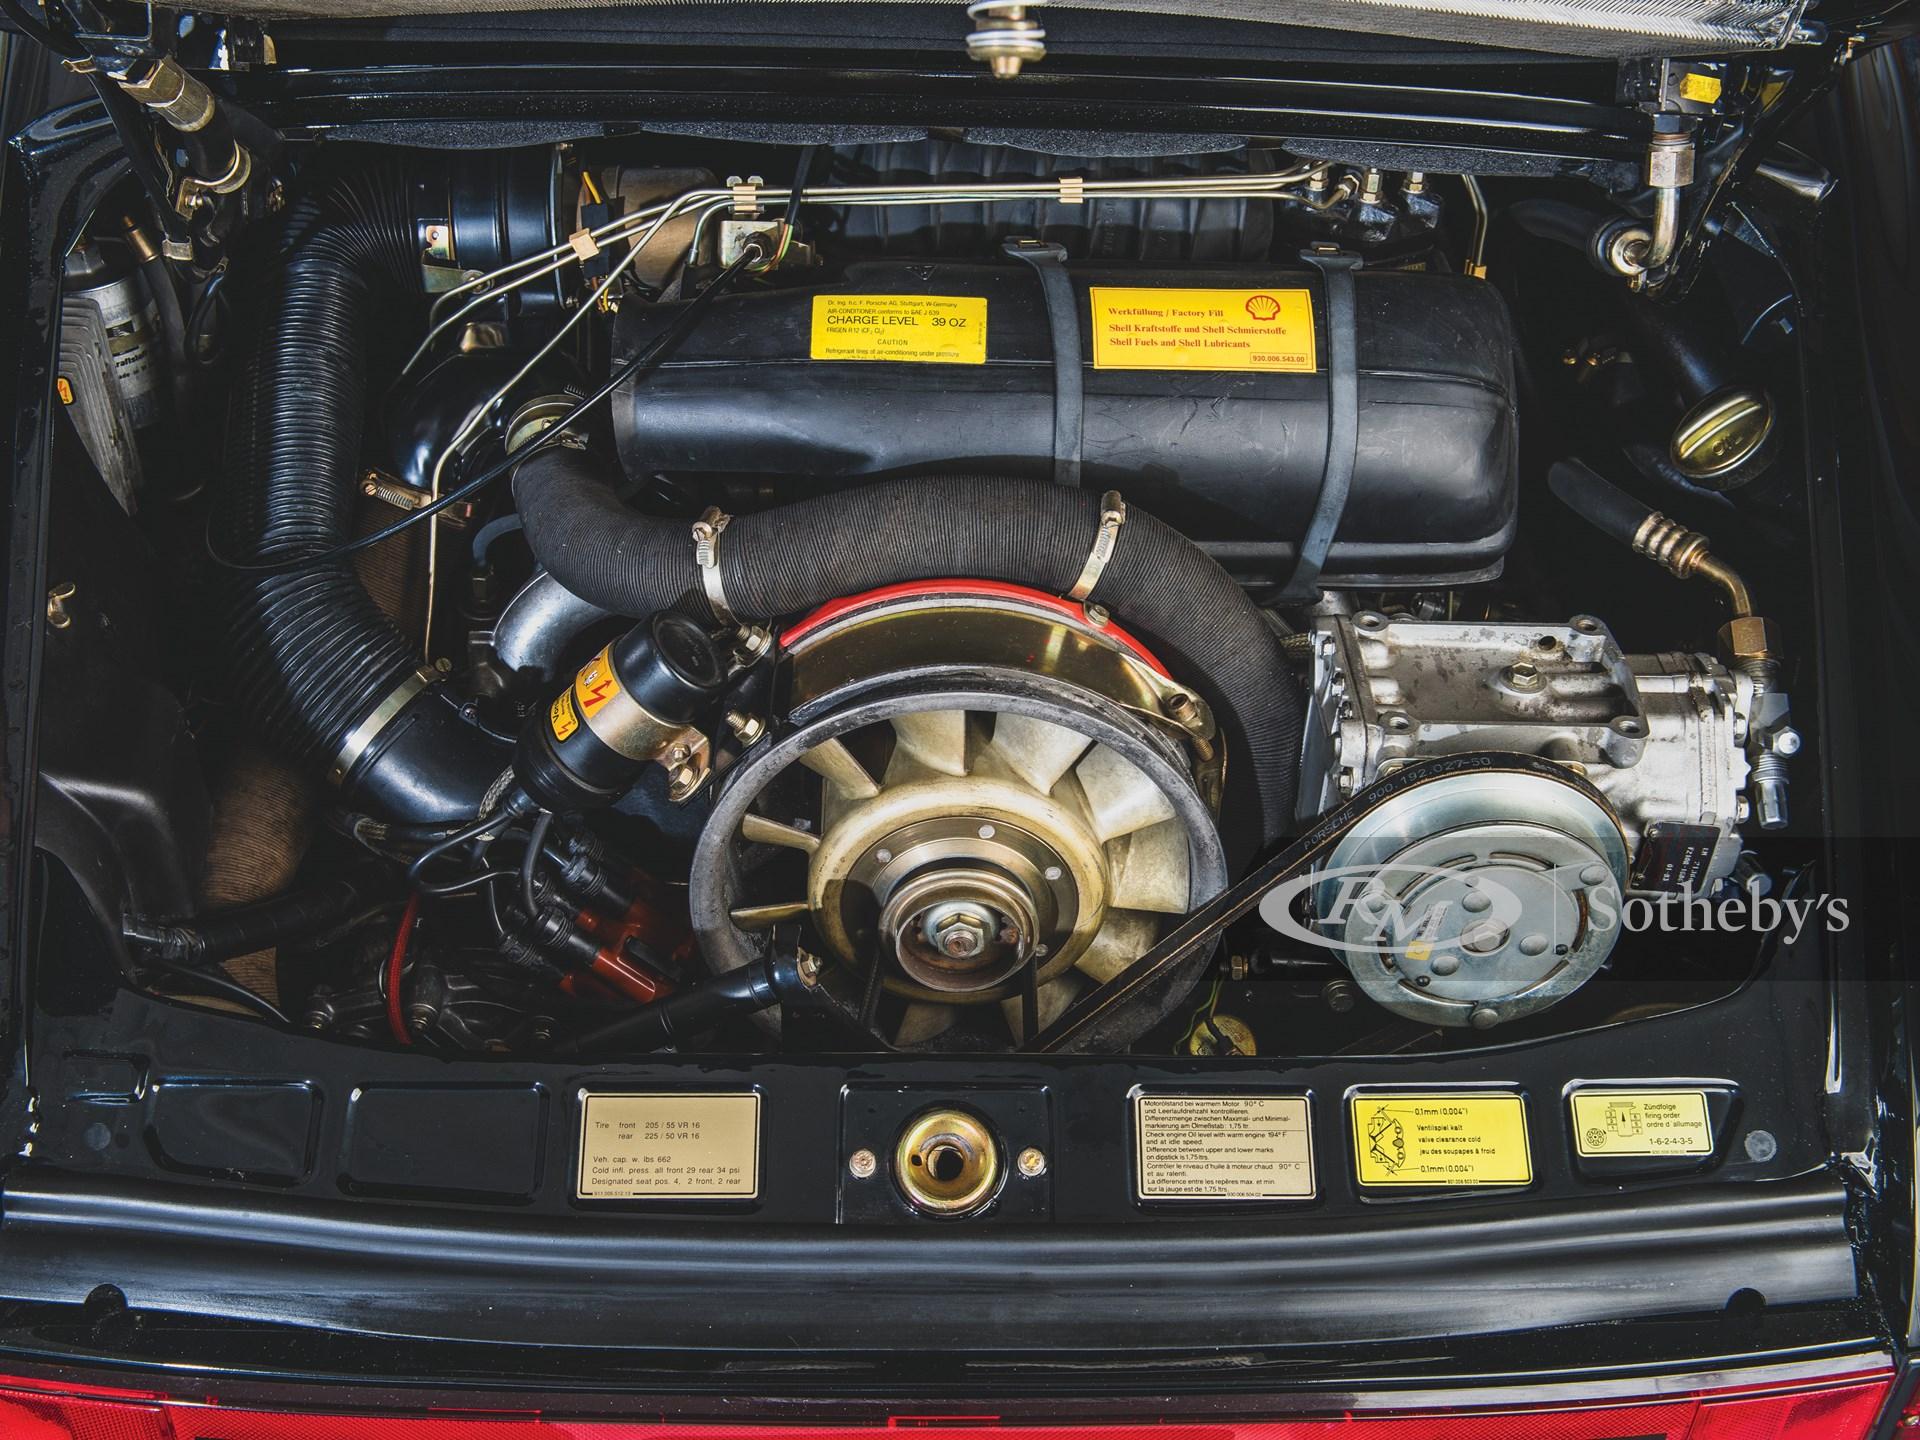 Difference Niveau Entre 2 Pieces 1983 porsche 911 sc cabriolet | the taj ma garaj collection